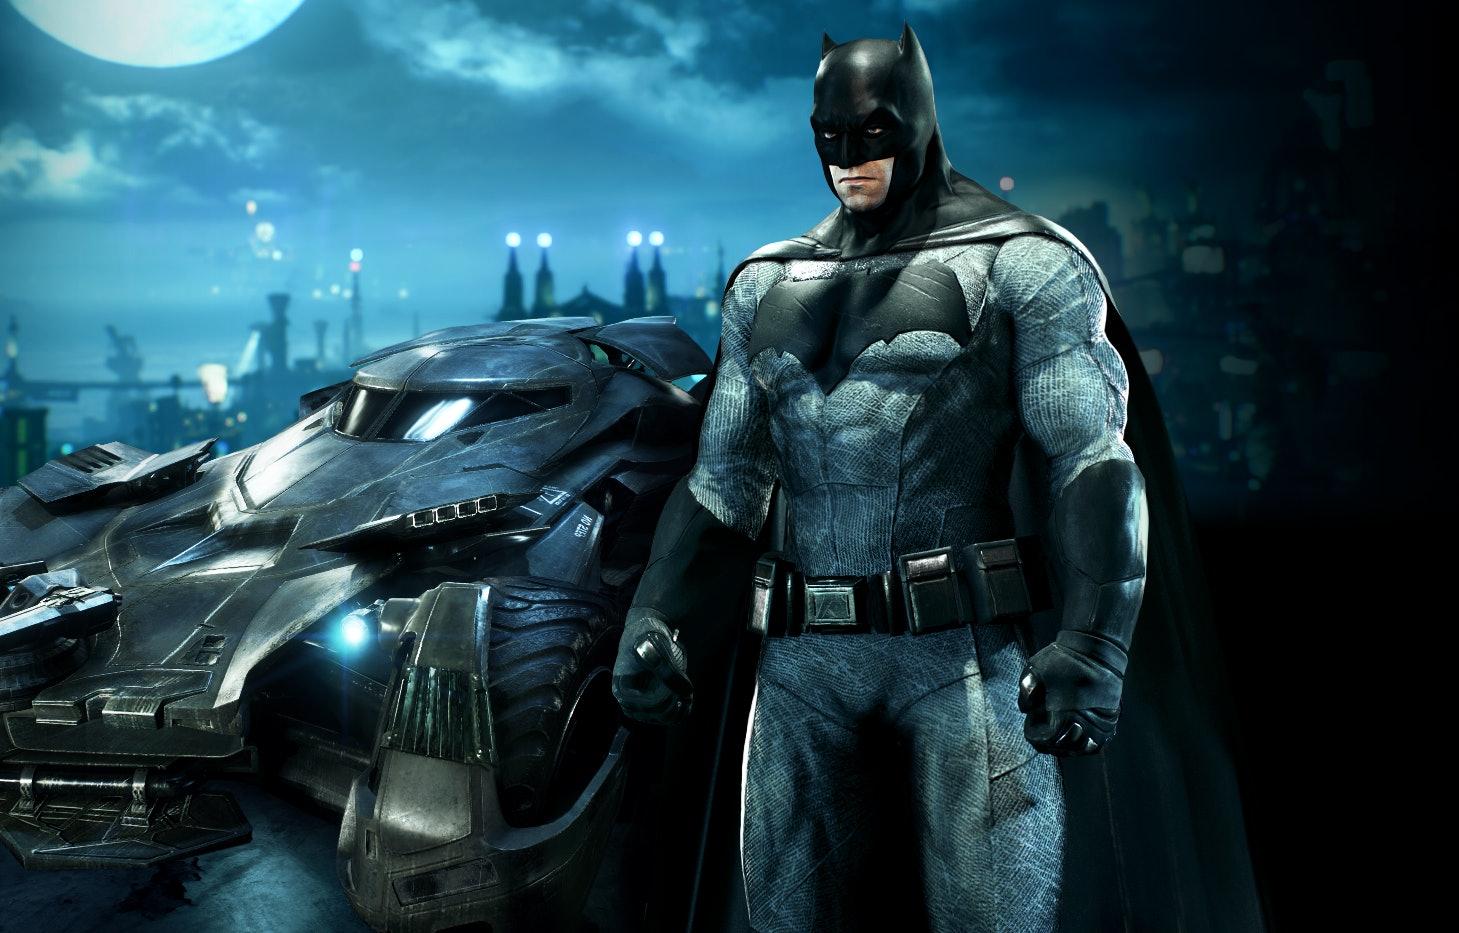 'Batman: Arkham Knight' DLC Has Affleck and Bale, Skips Clooney and Kilmer